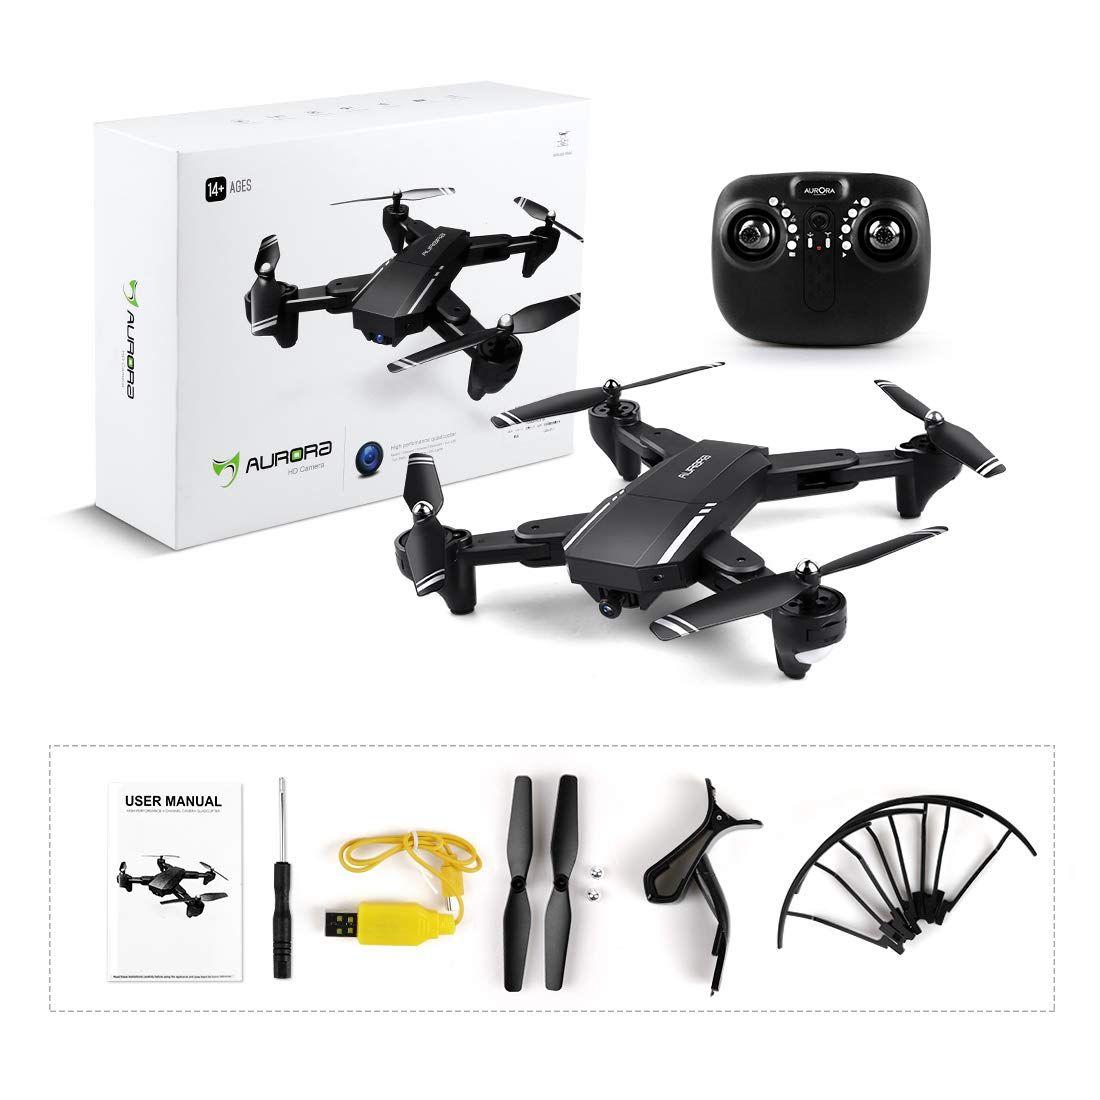 lbla_foldable_drone